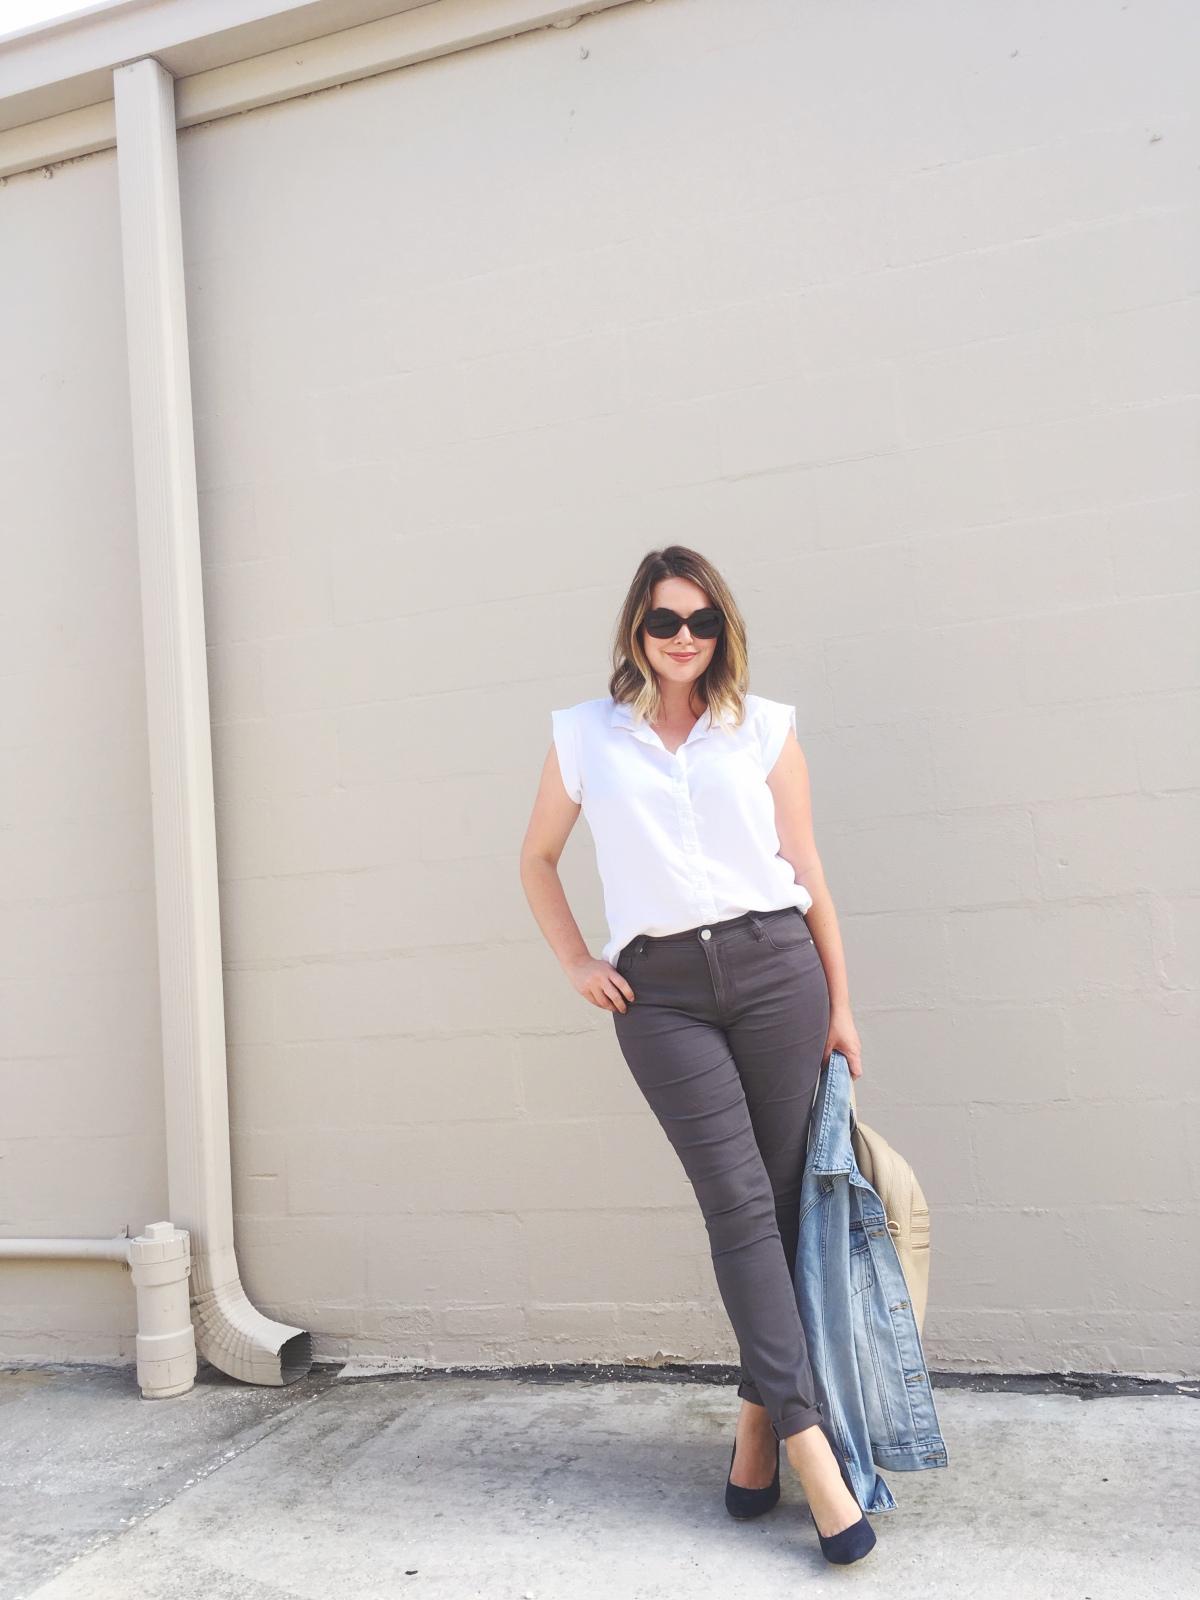 Fall 2016 LOFT Sateen Five Pocket Leggings, OOTD, Budget Style, Women's Fashion, keiralennox.com